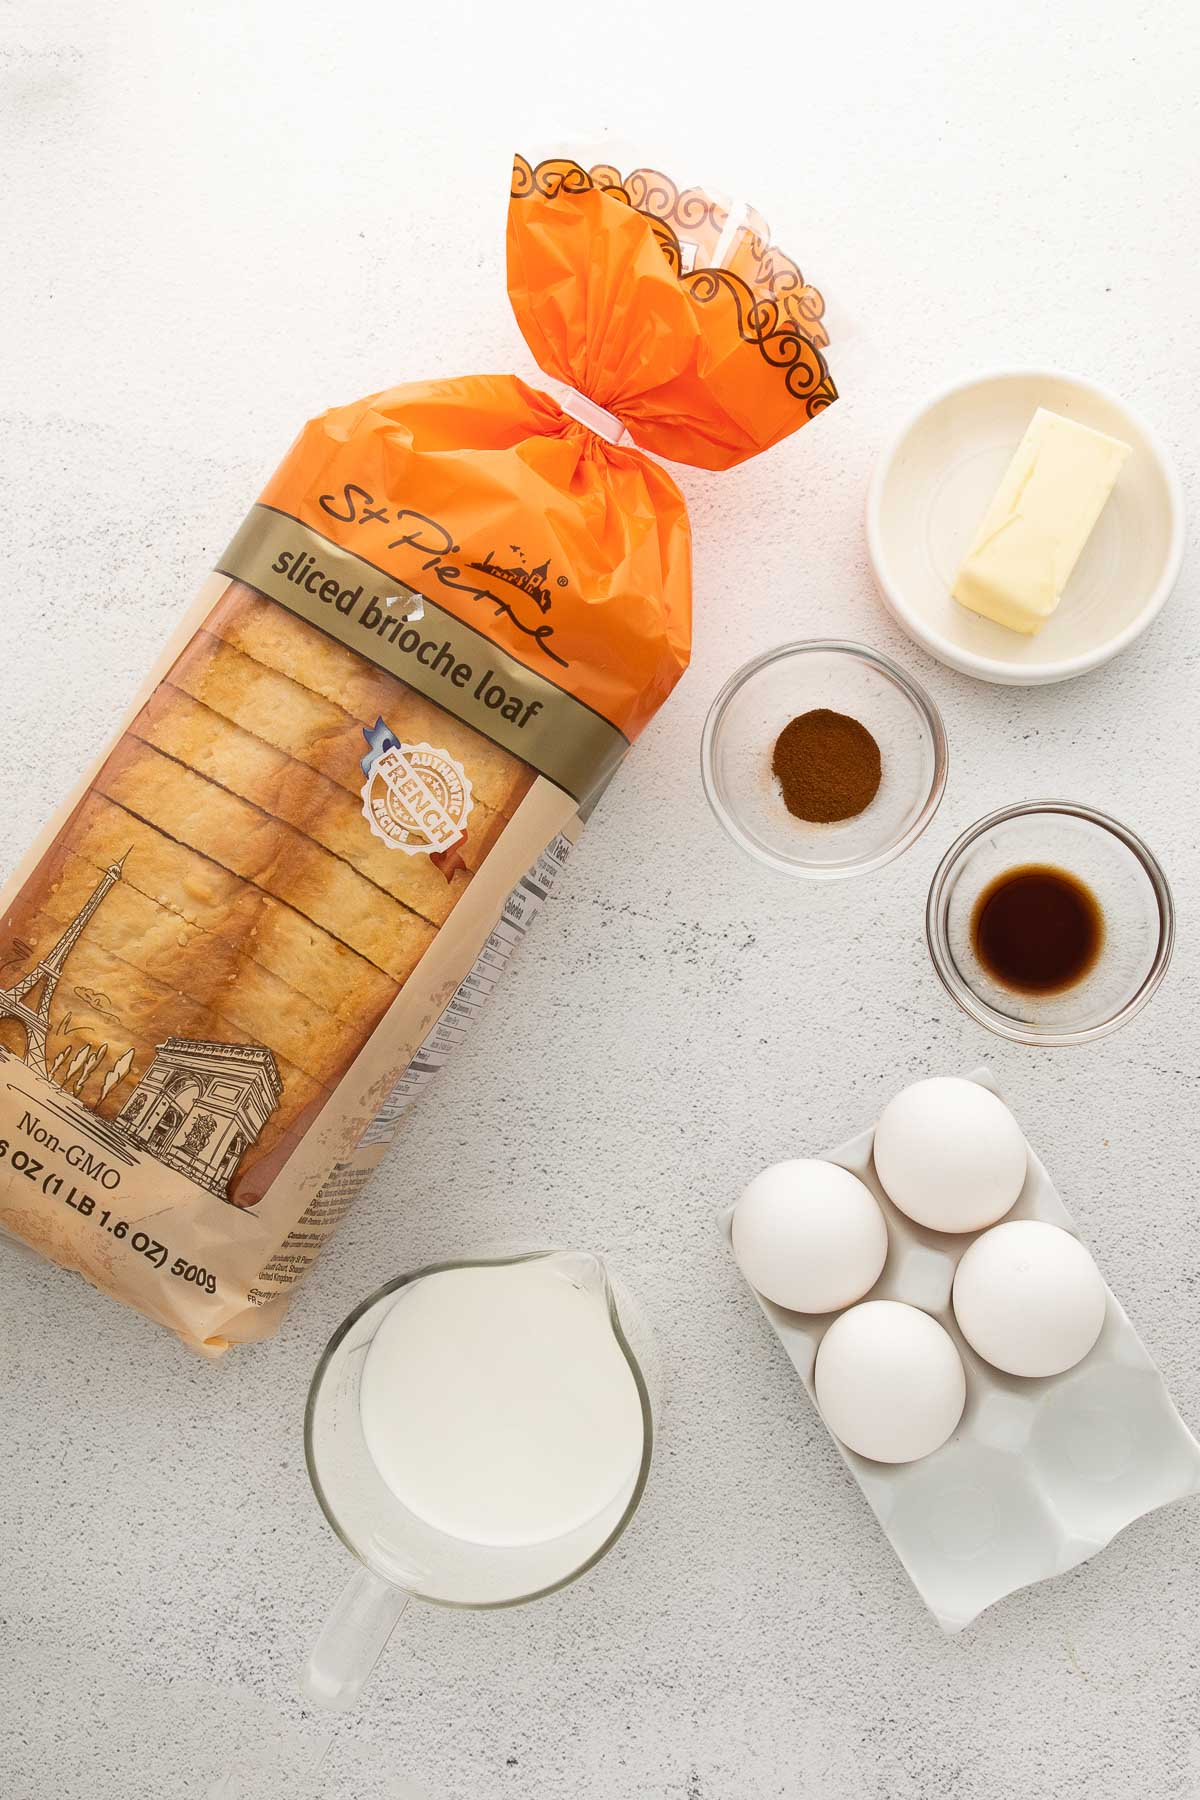 loaf of brioche bread, 4 eggs and bowls of milk, vanilla, cinnamon and butter